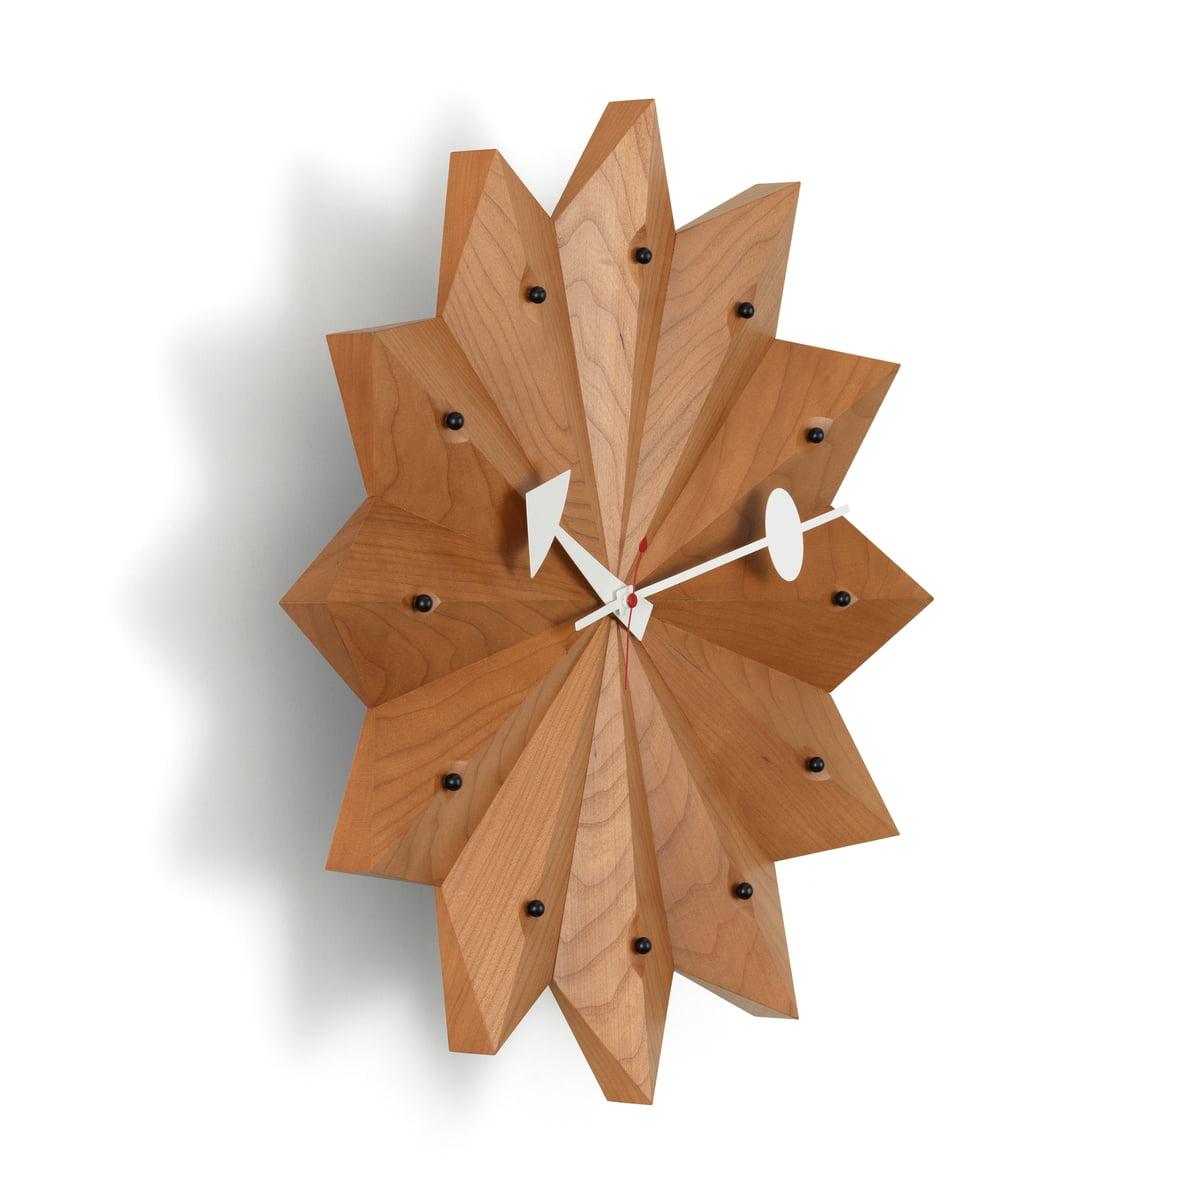 horloge par george nelson | vitra | connox